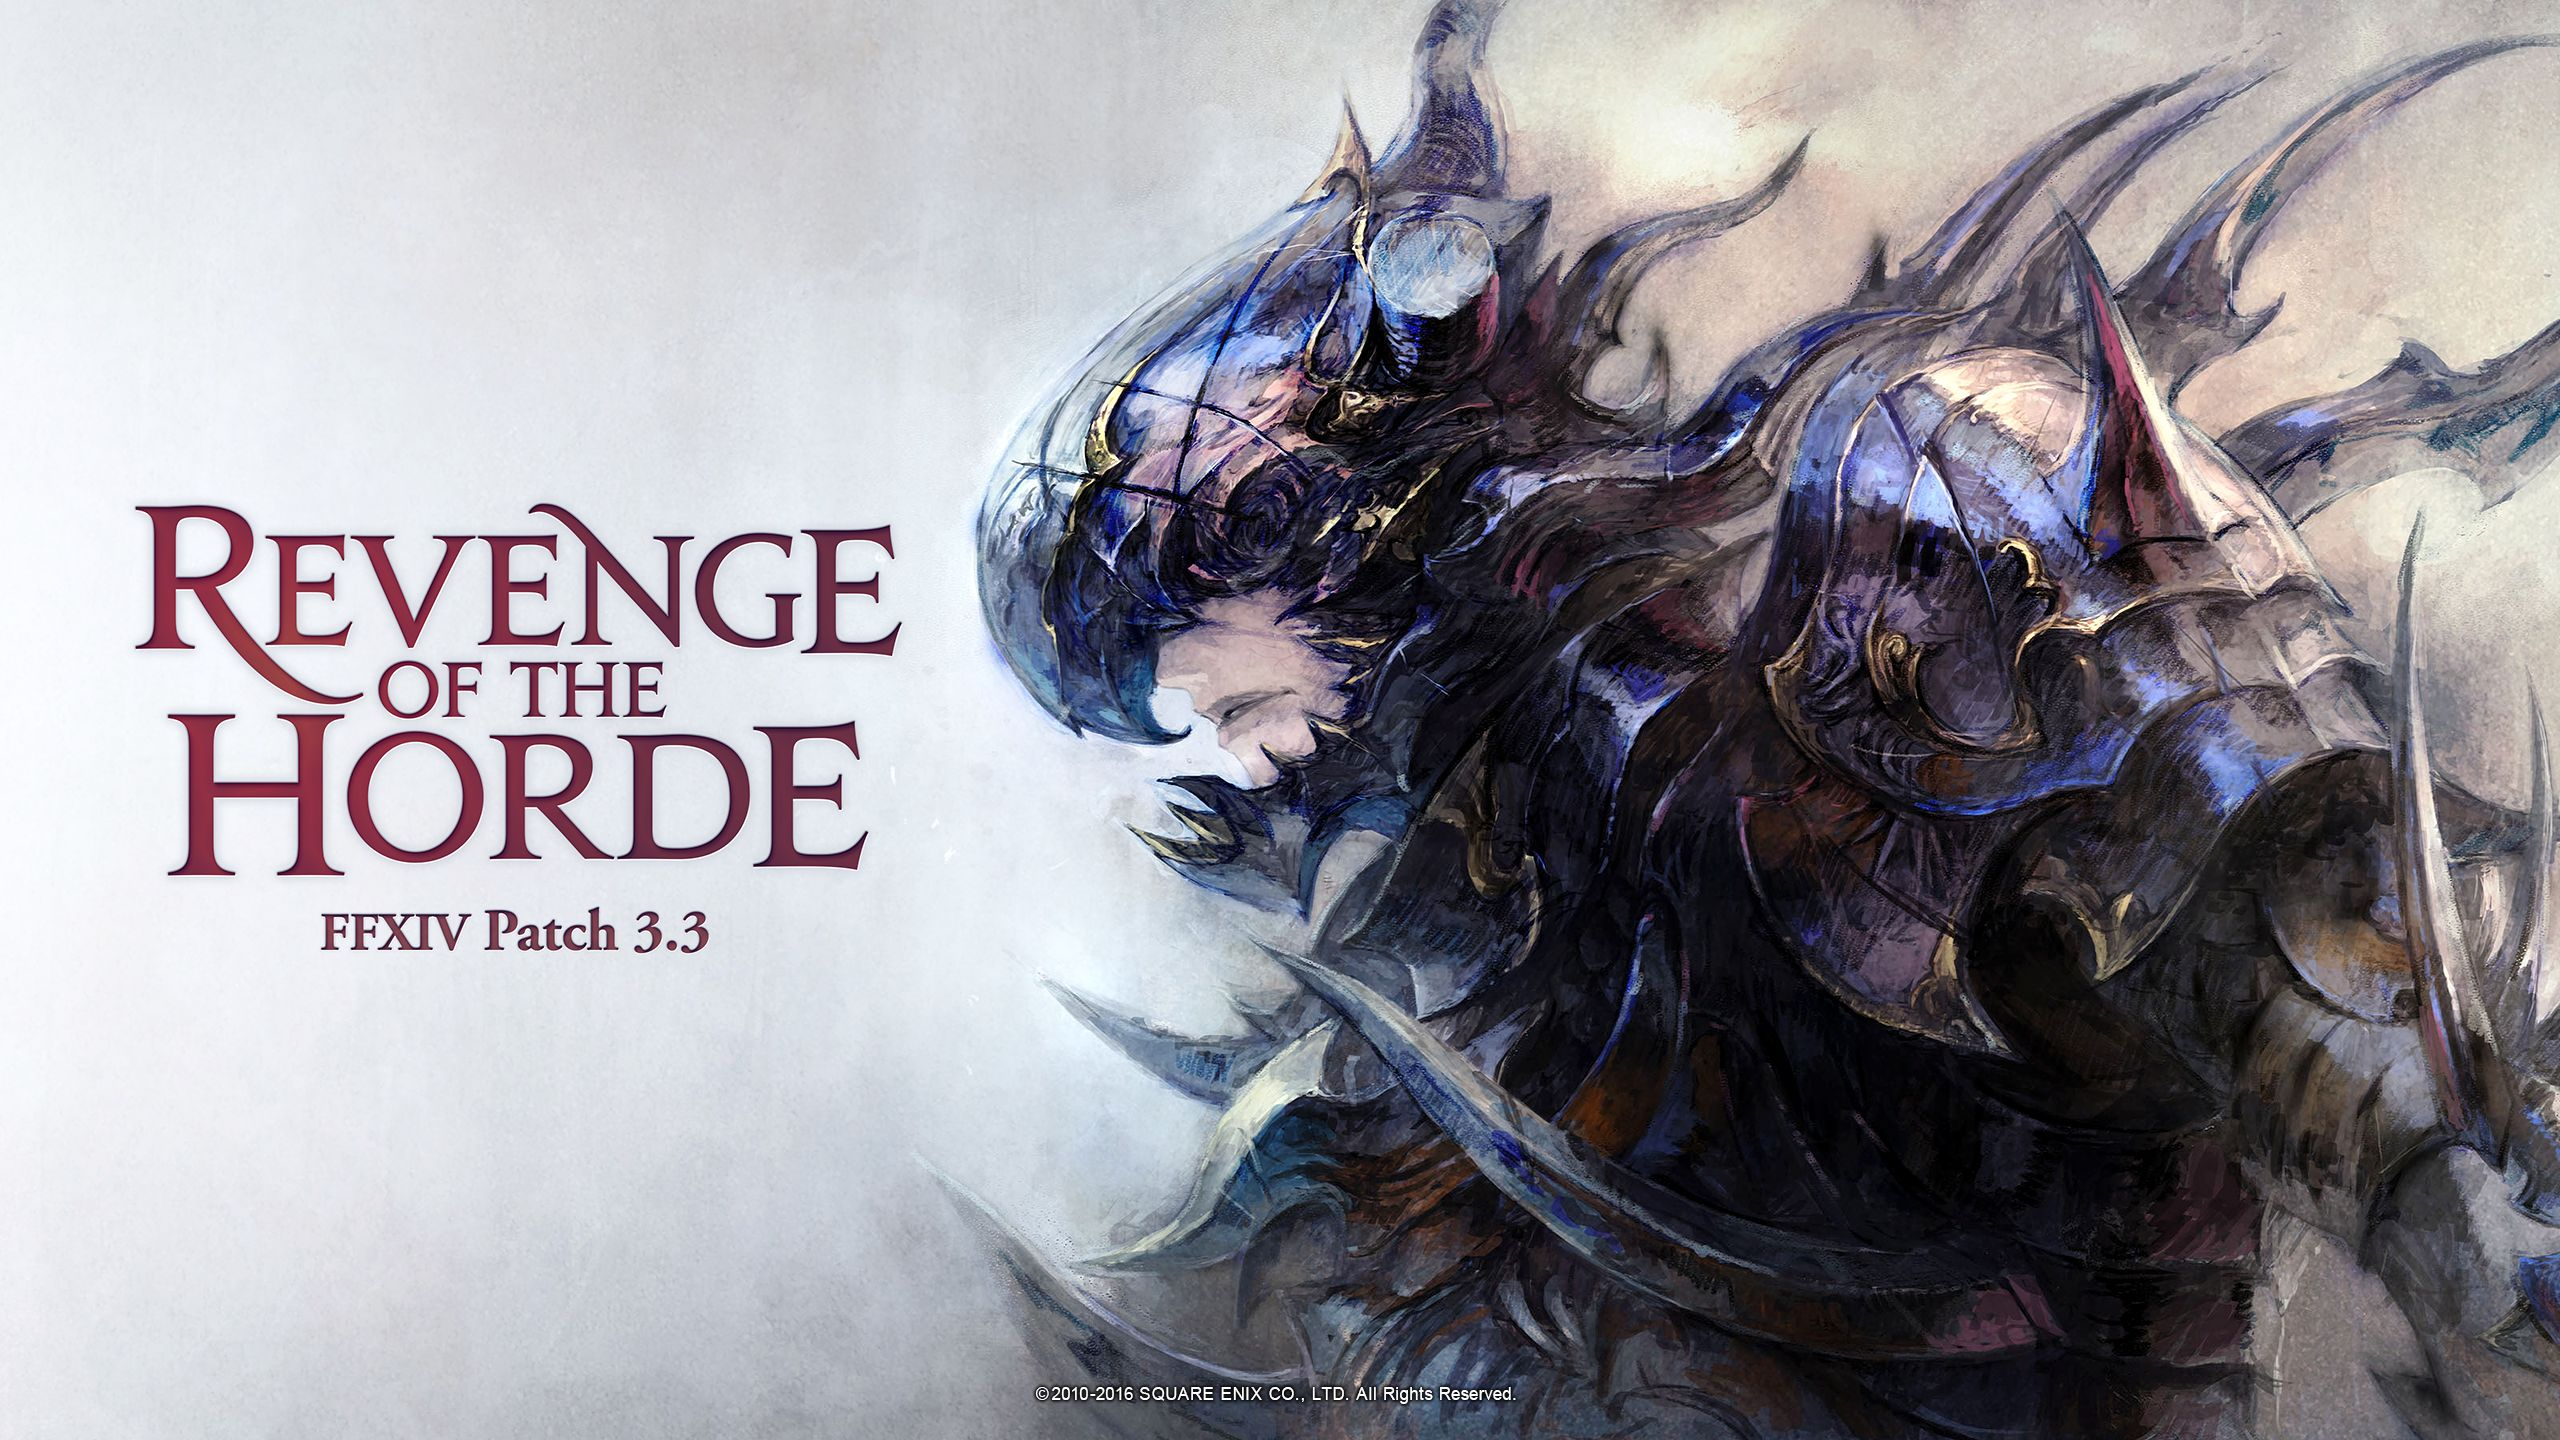 Final Fantasy Xiv Wallpapers Top Free Final Fantasy Xiv